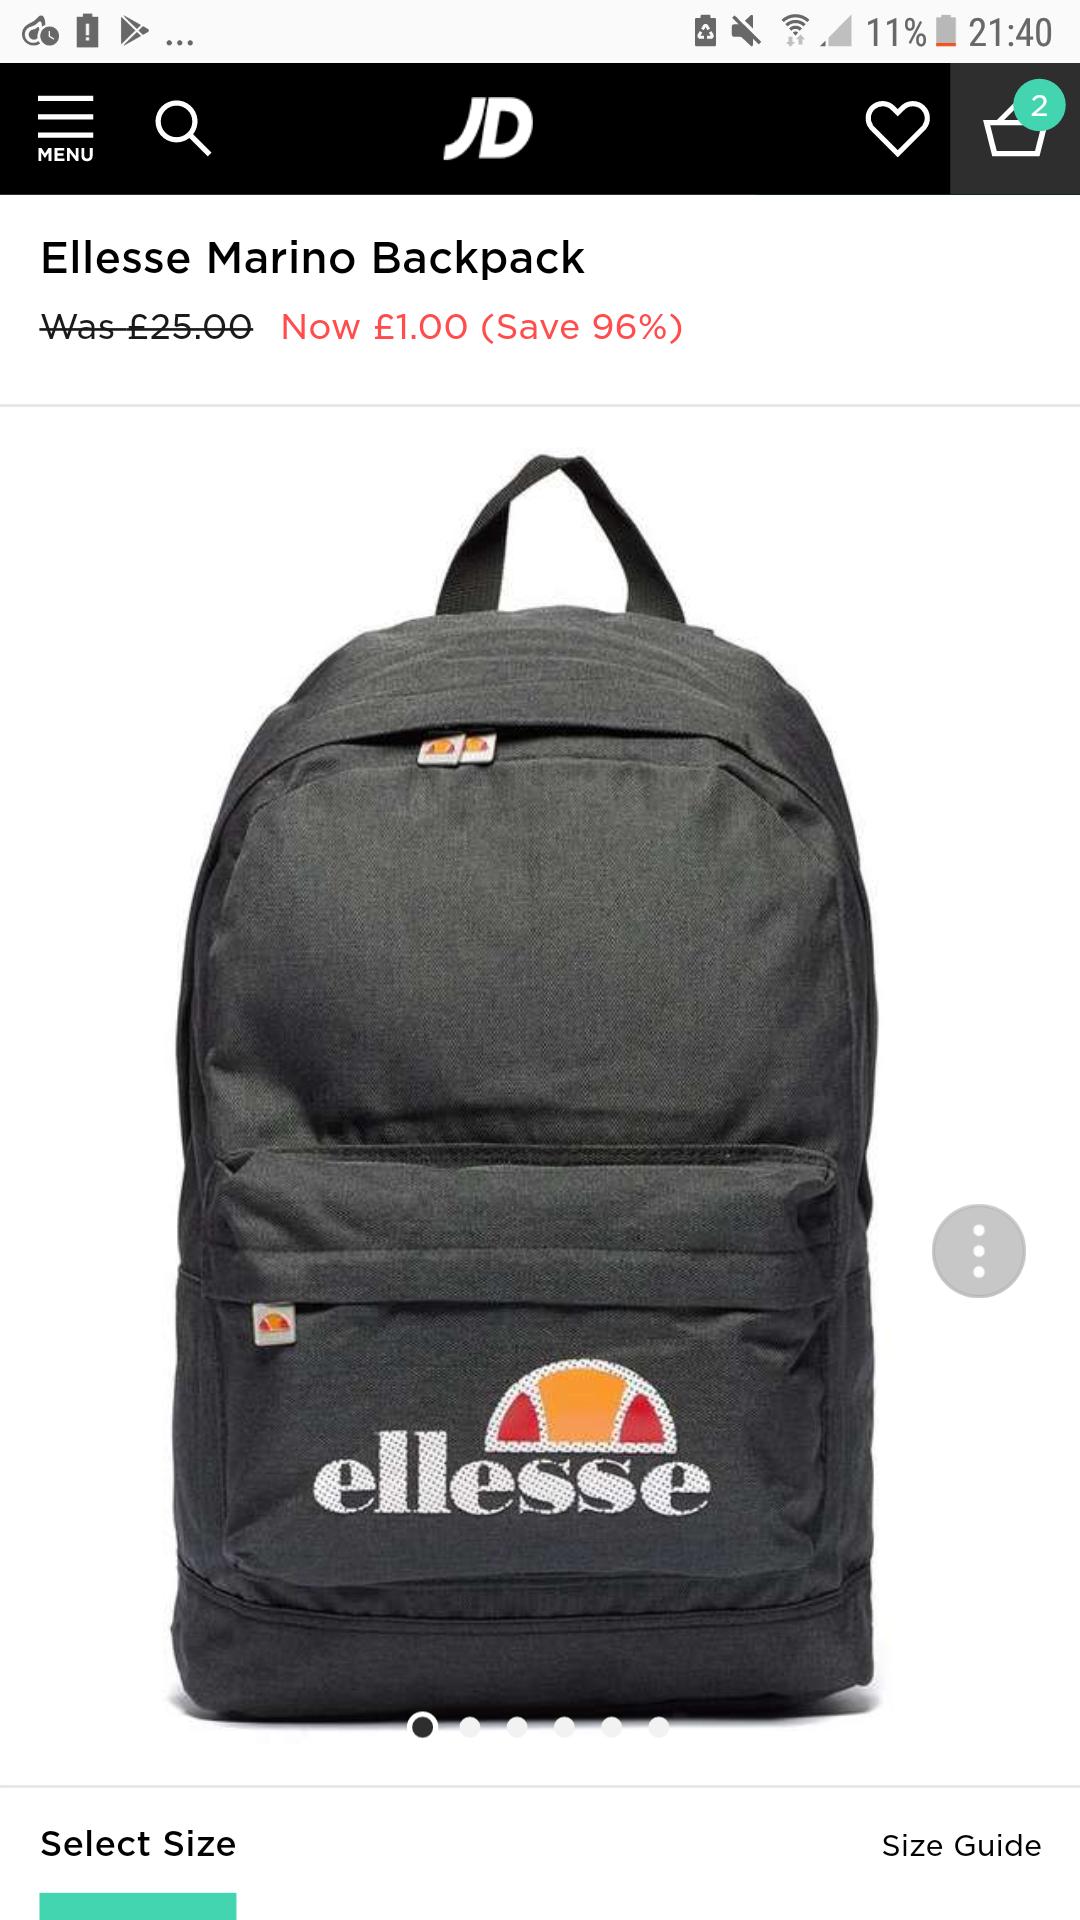 Ellesse Marino Backpack - £1 @ JD Sports (C&C)